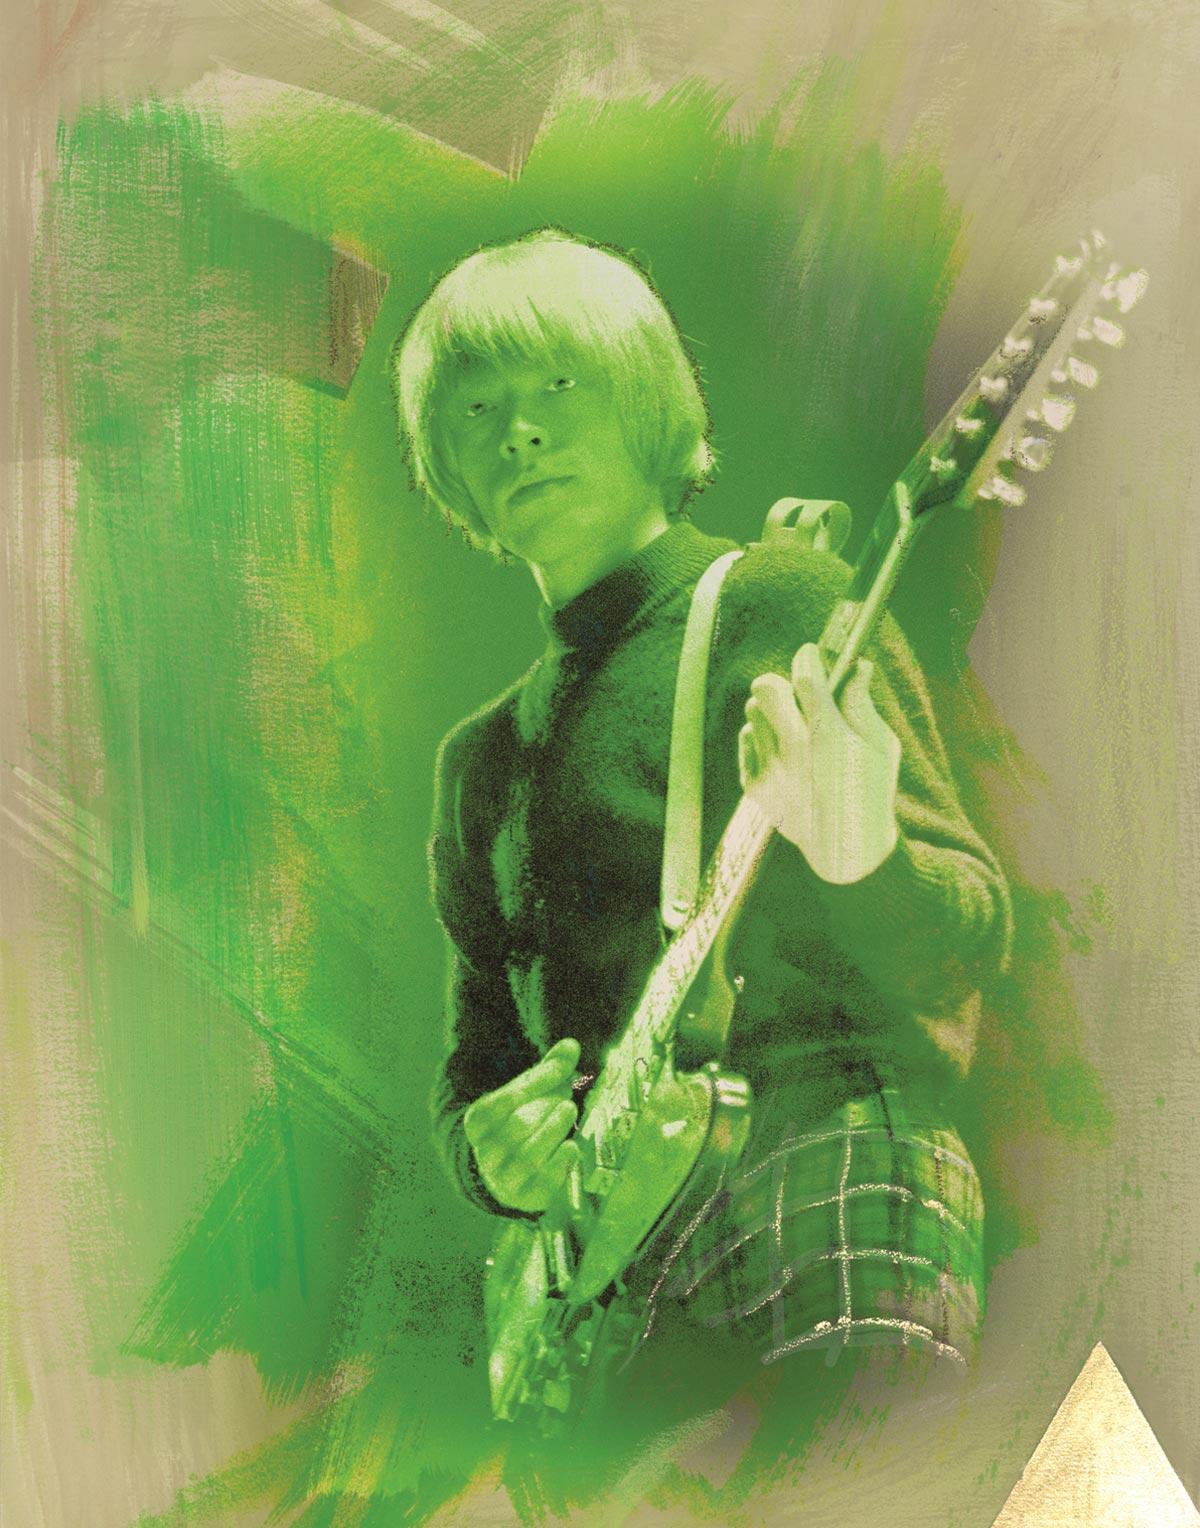 Brian Splash – Neon Green Gold 2017featuring Brian Jones